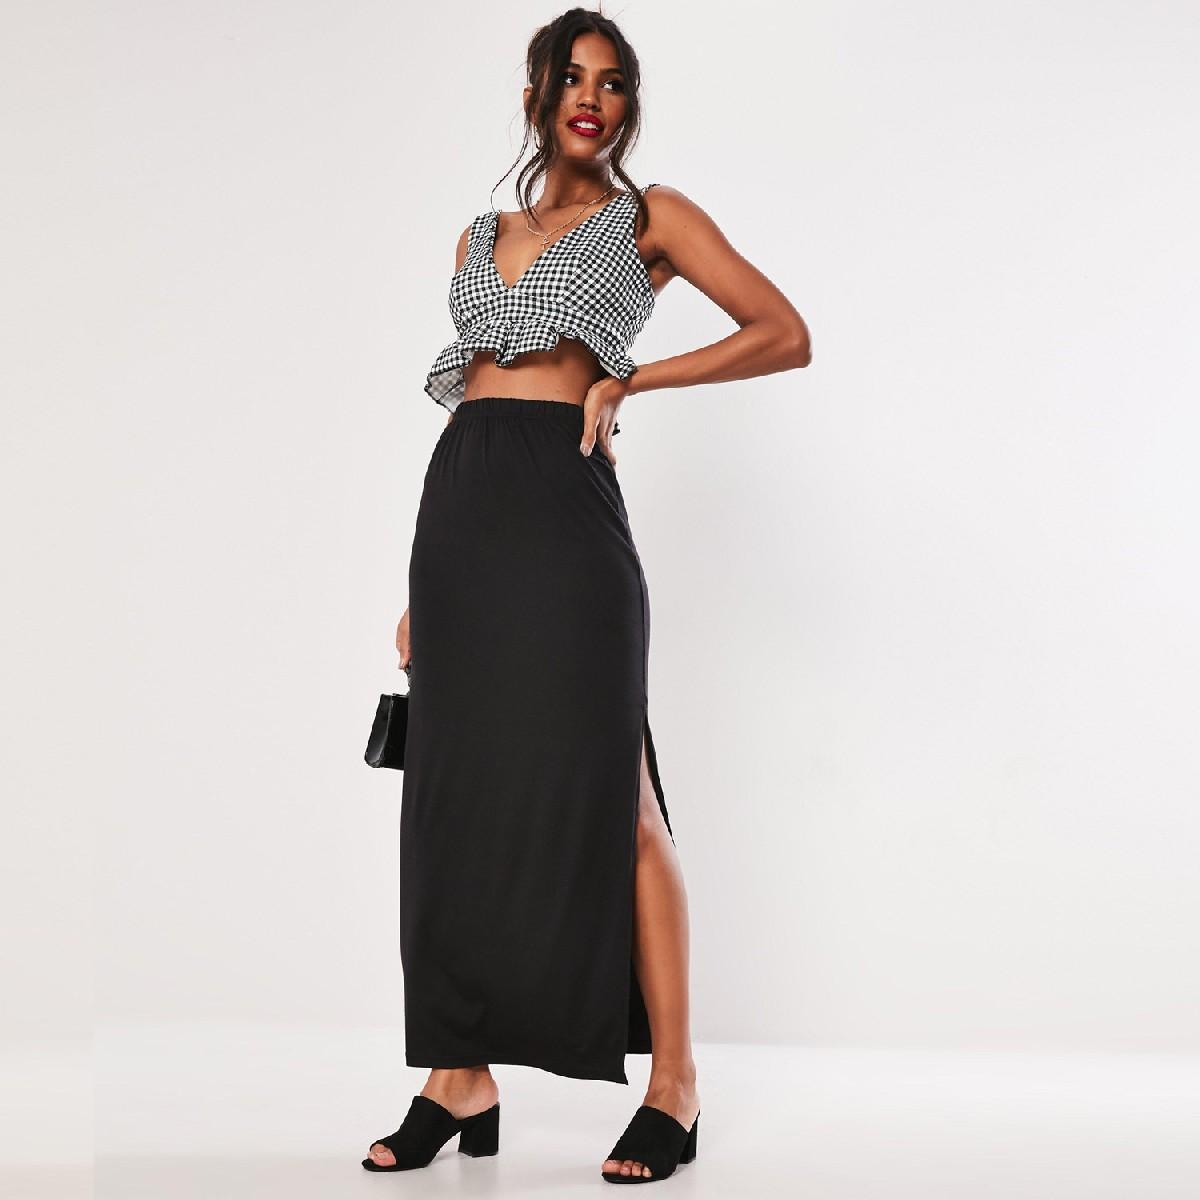 MISSGUIDED (BG-11-i) Black Viscose Jersey Side Split Maxi Skirt